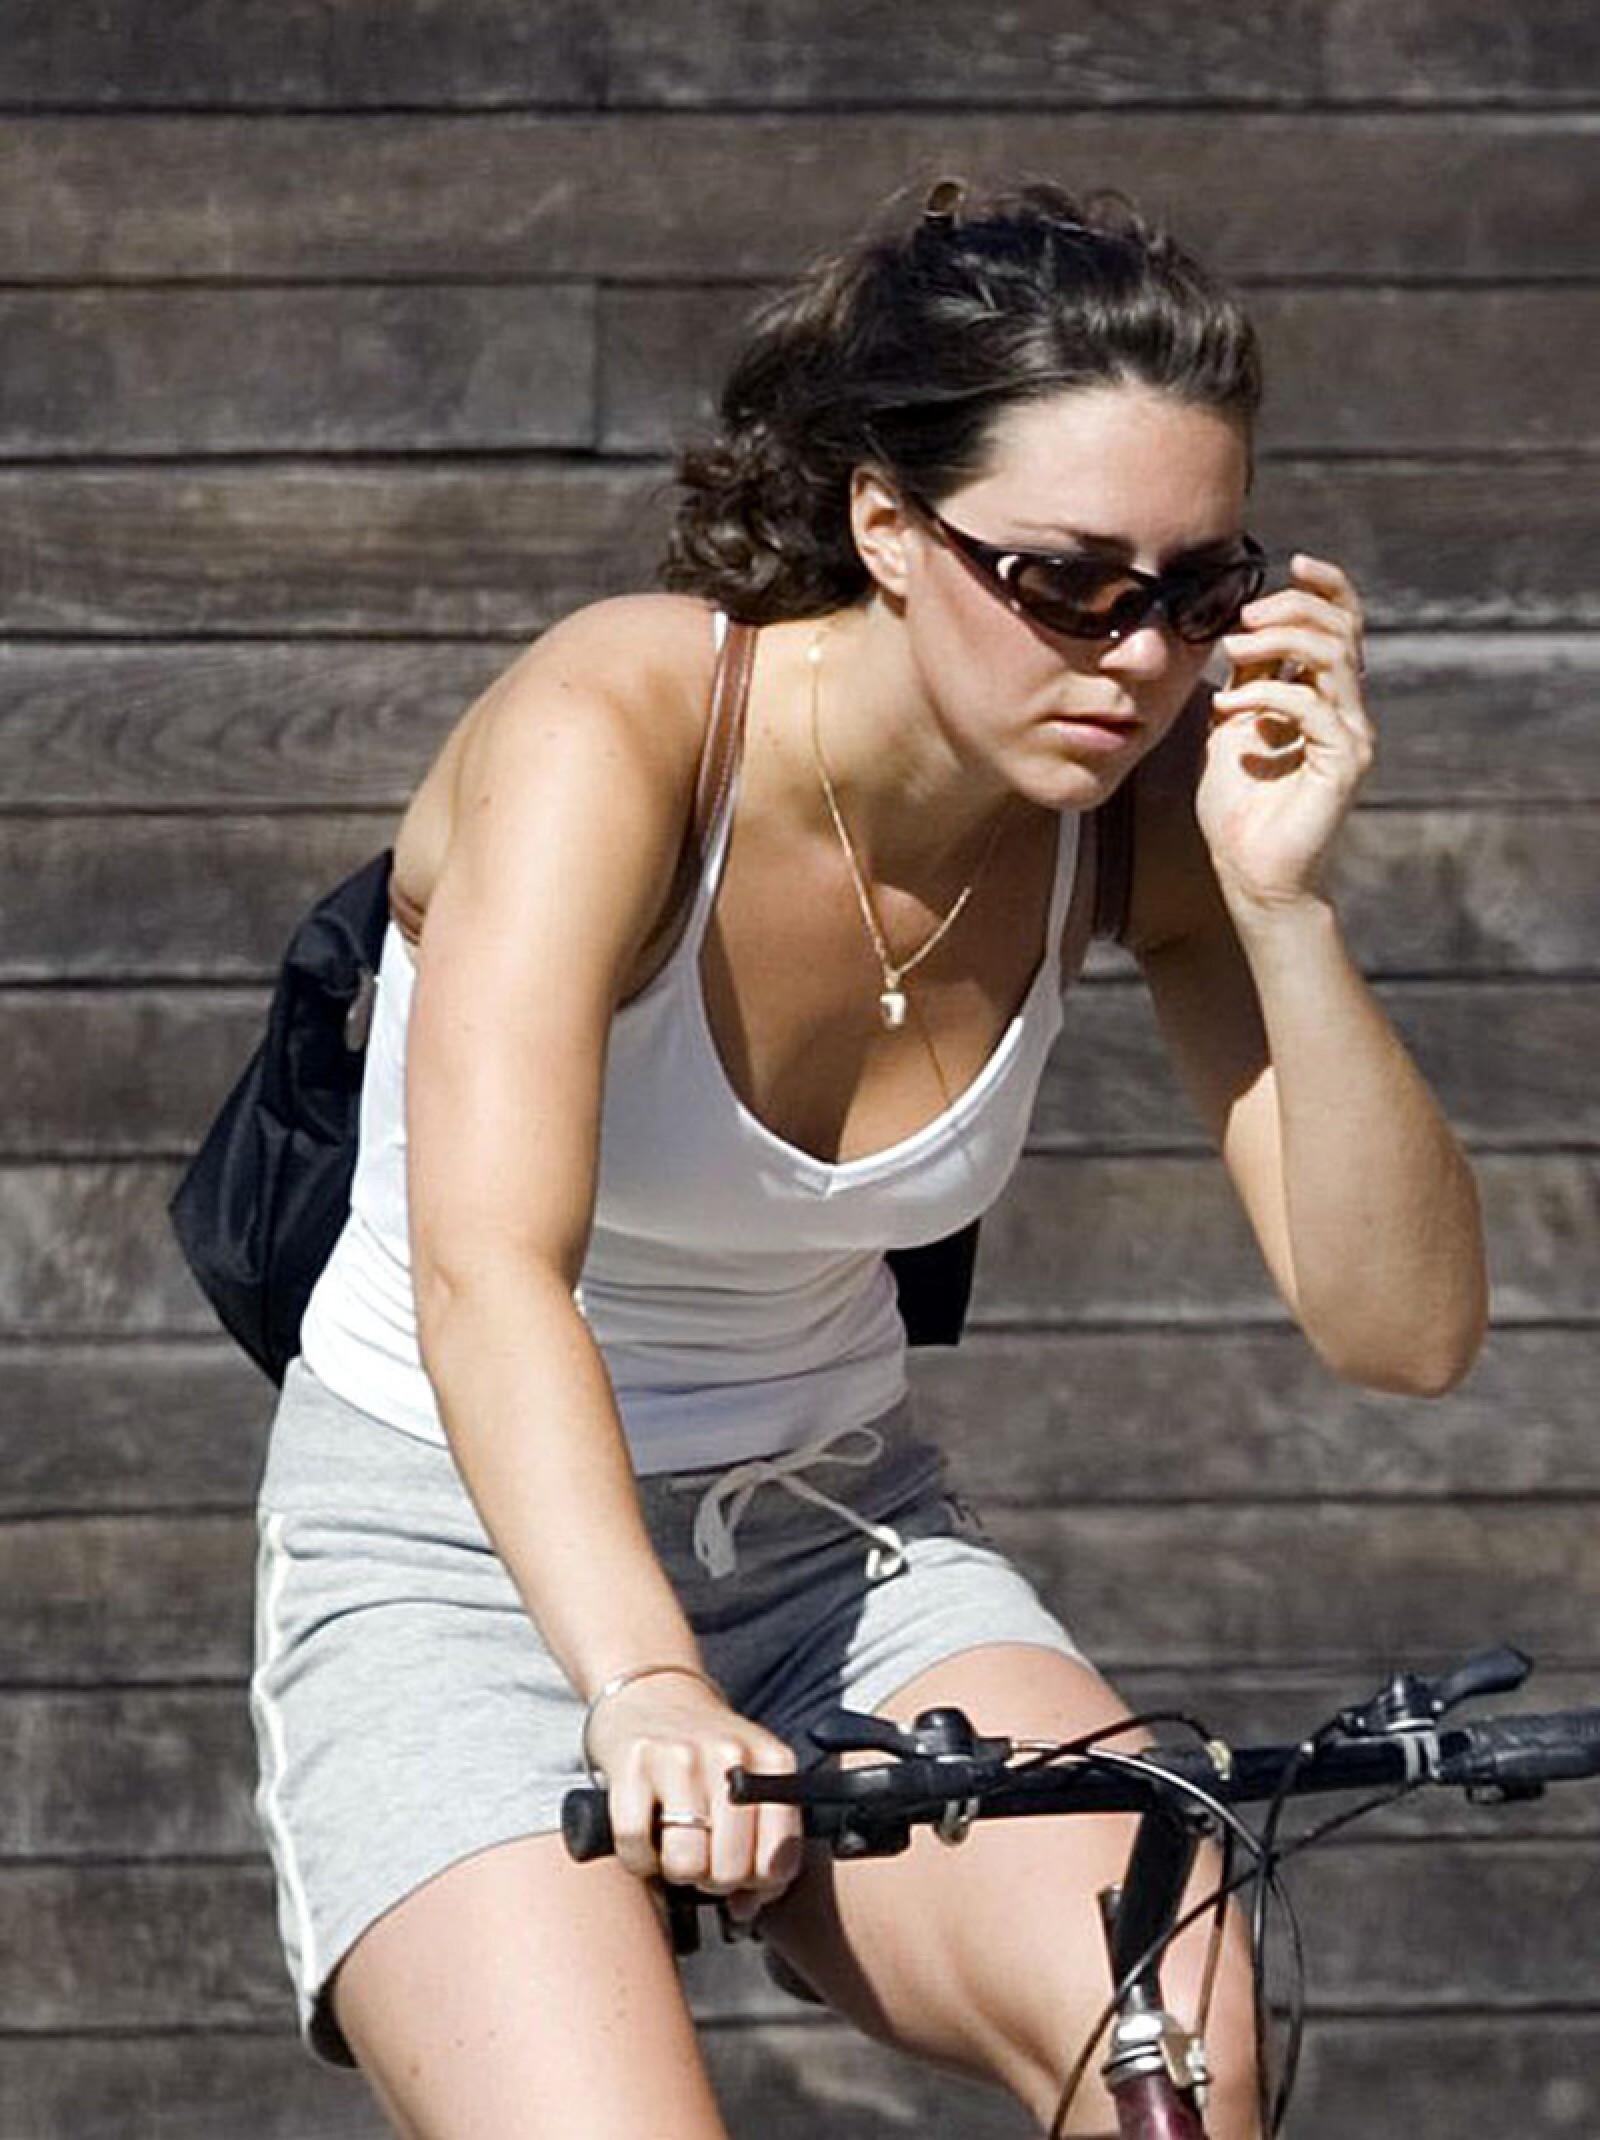 KATE MIDDLETON CYCLING NEAR BUCKLEBURY, BRITAIN - 12 JUL 2005